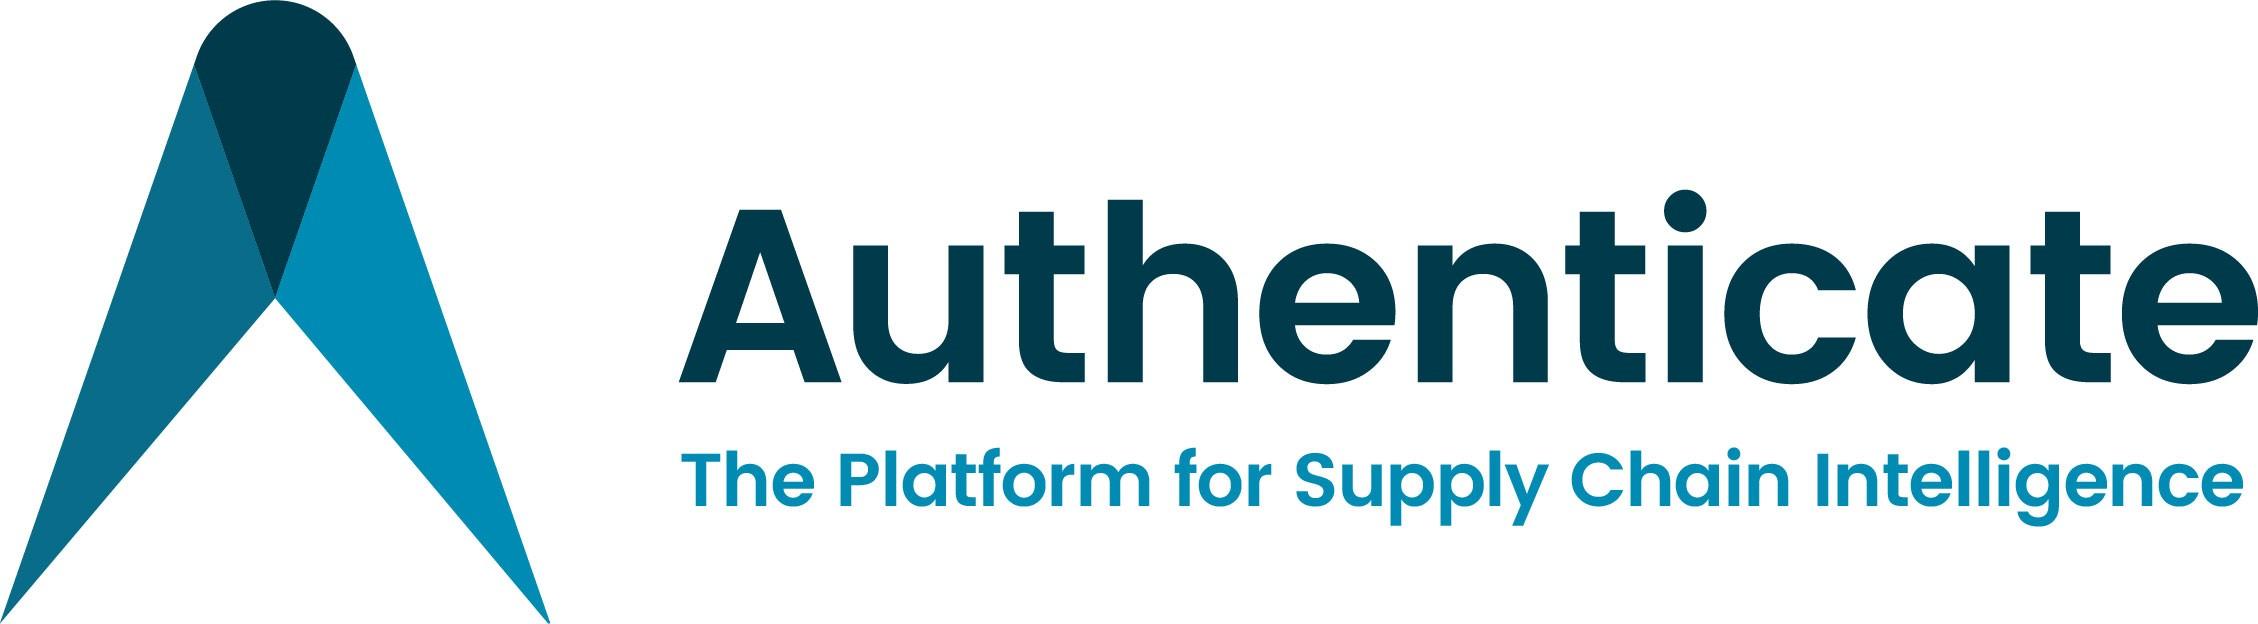 Image authenticate platform logo